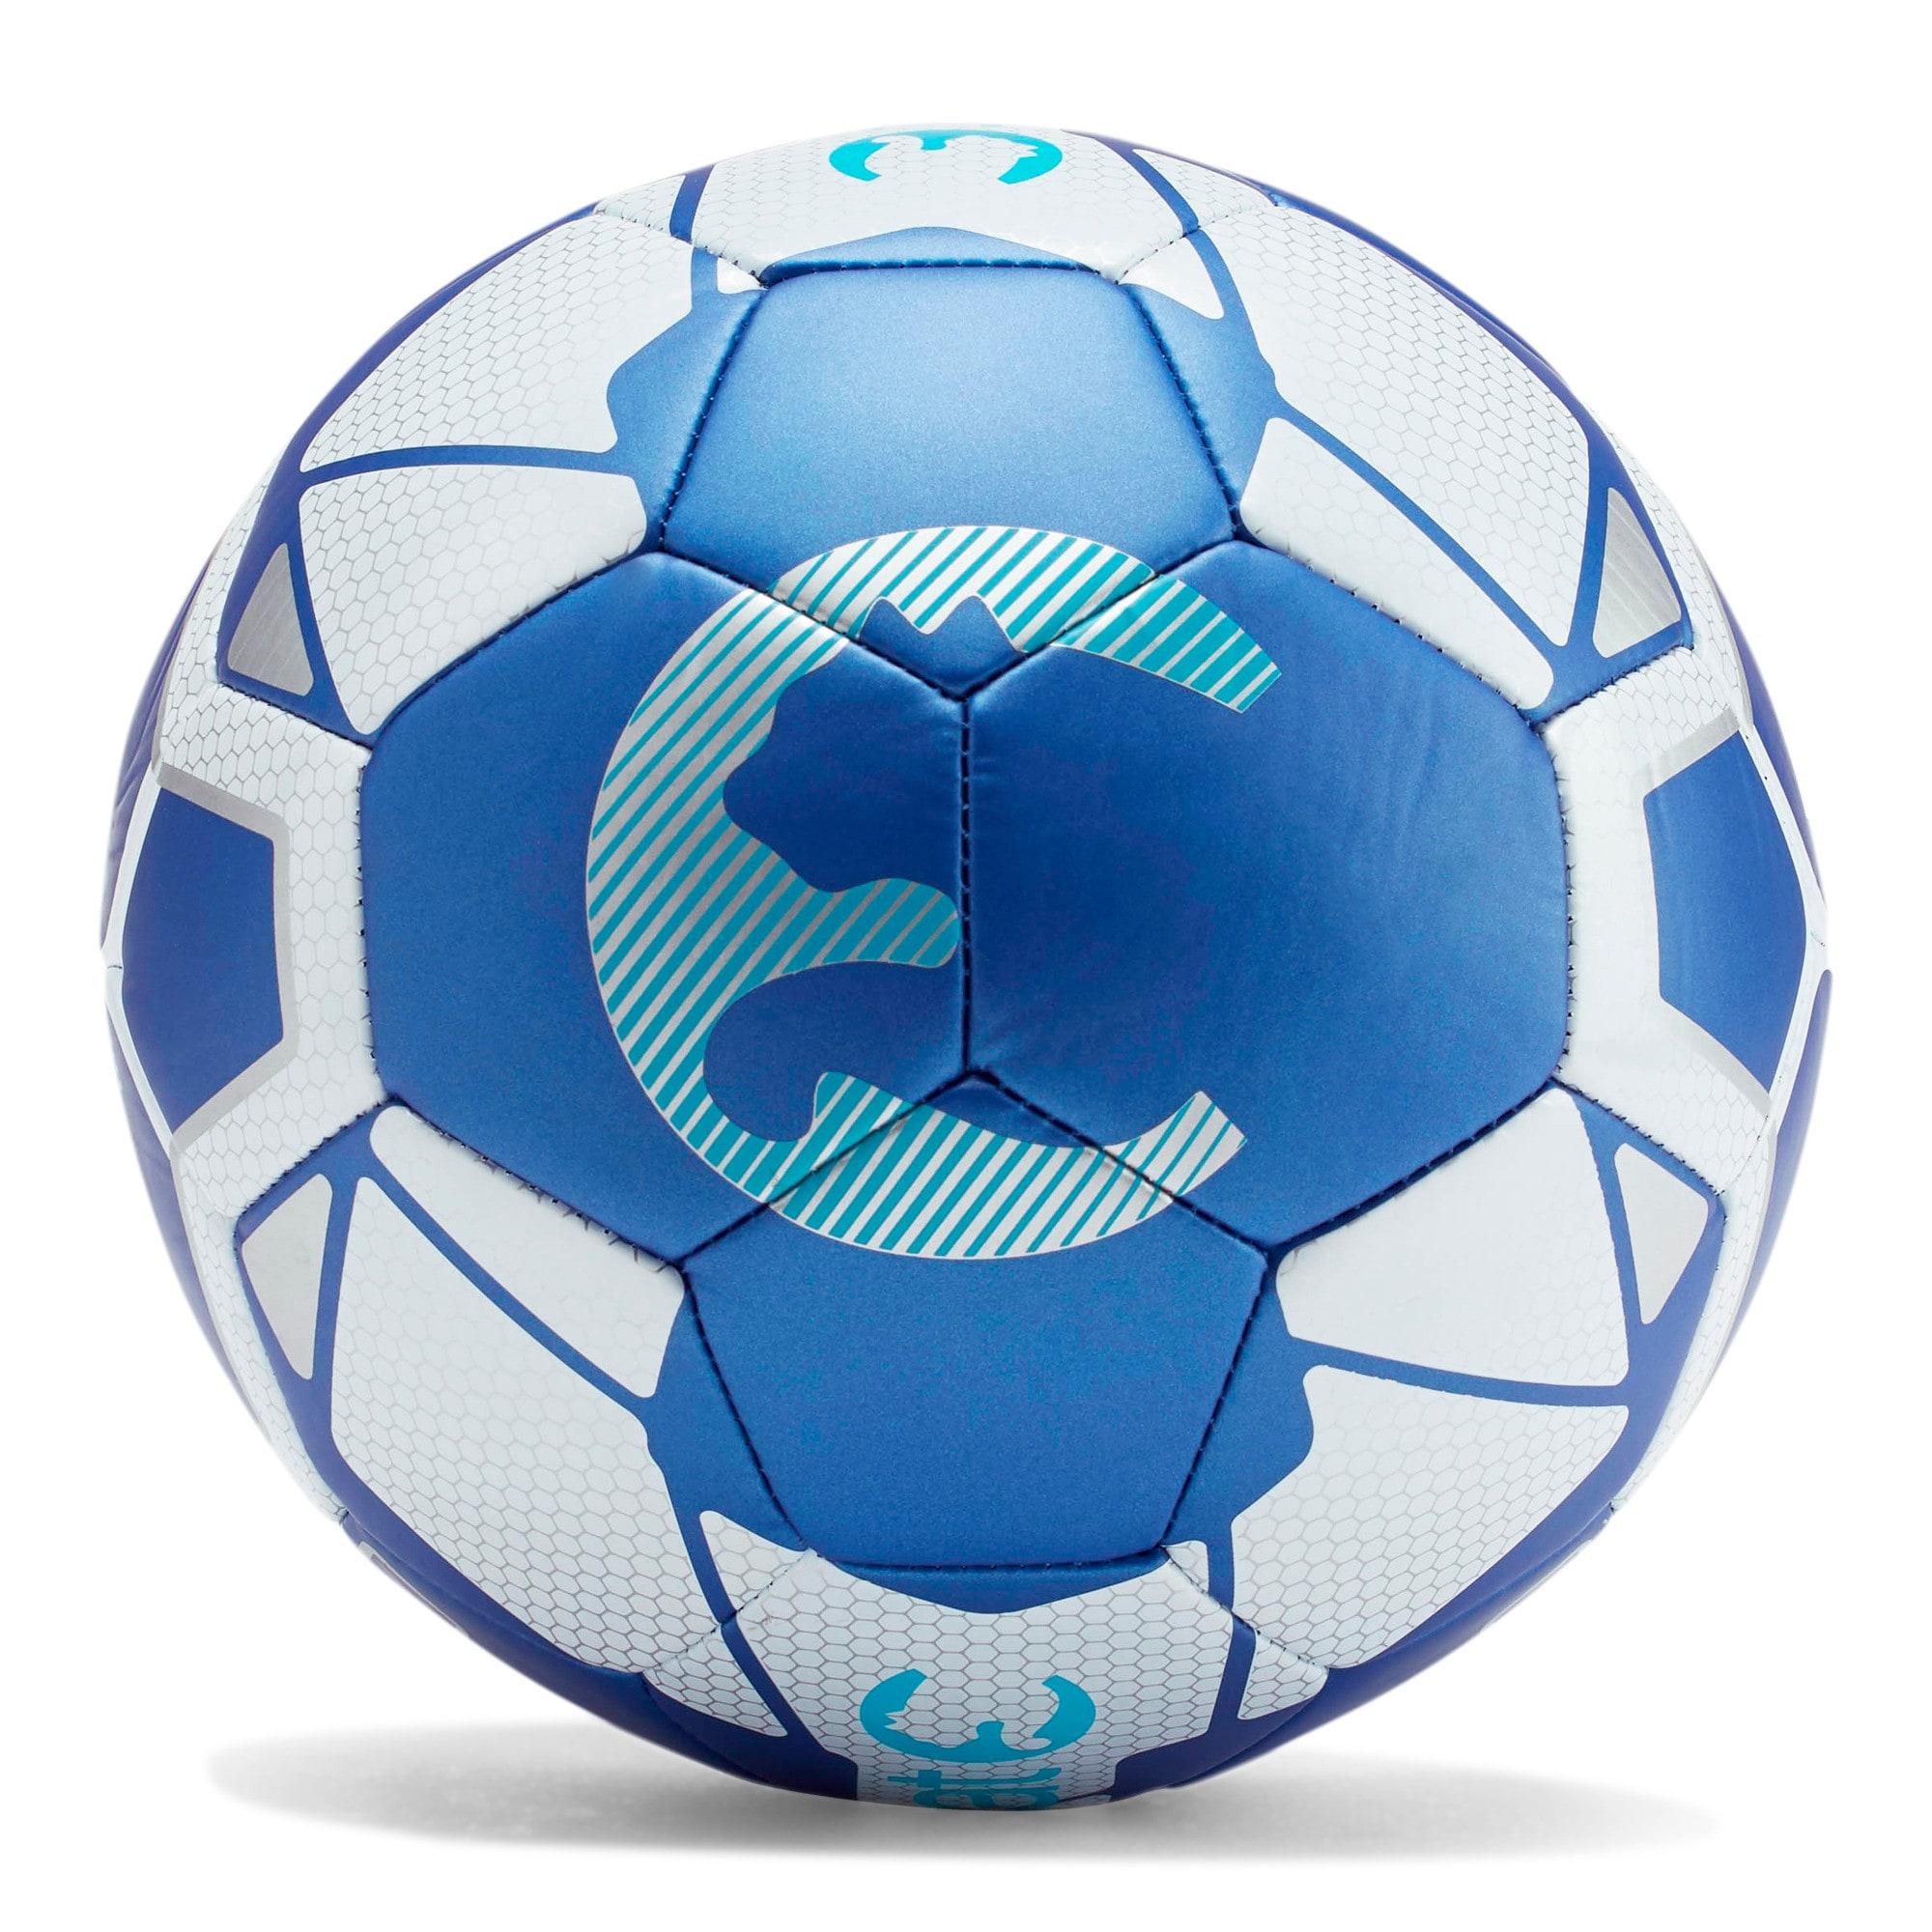 Thumbnail 2 of ProCat Fractal Soccer Ball, BLUE, medium